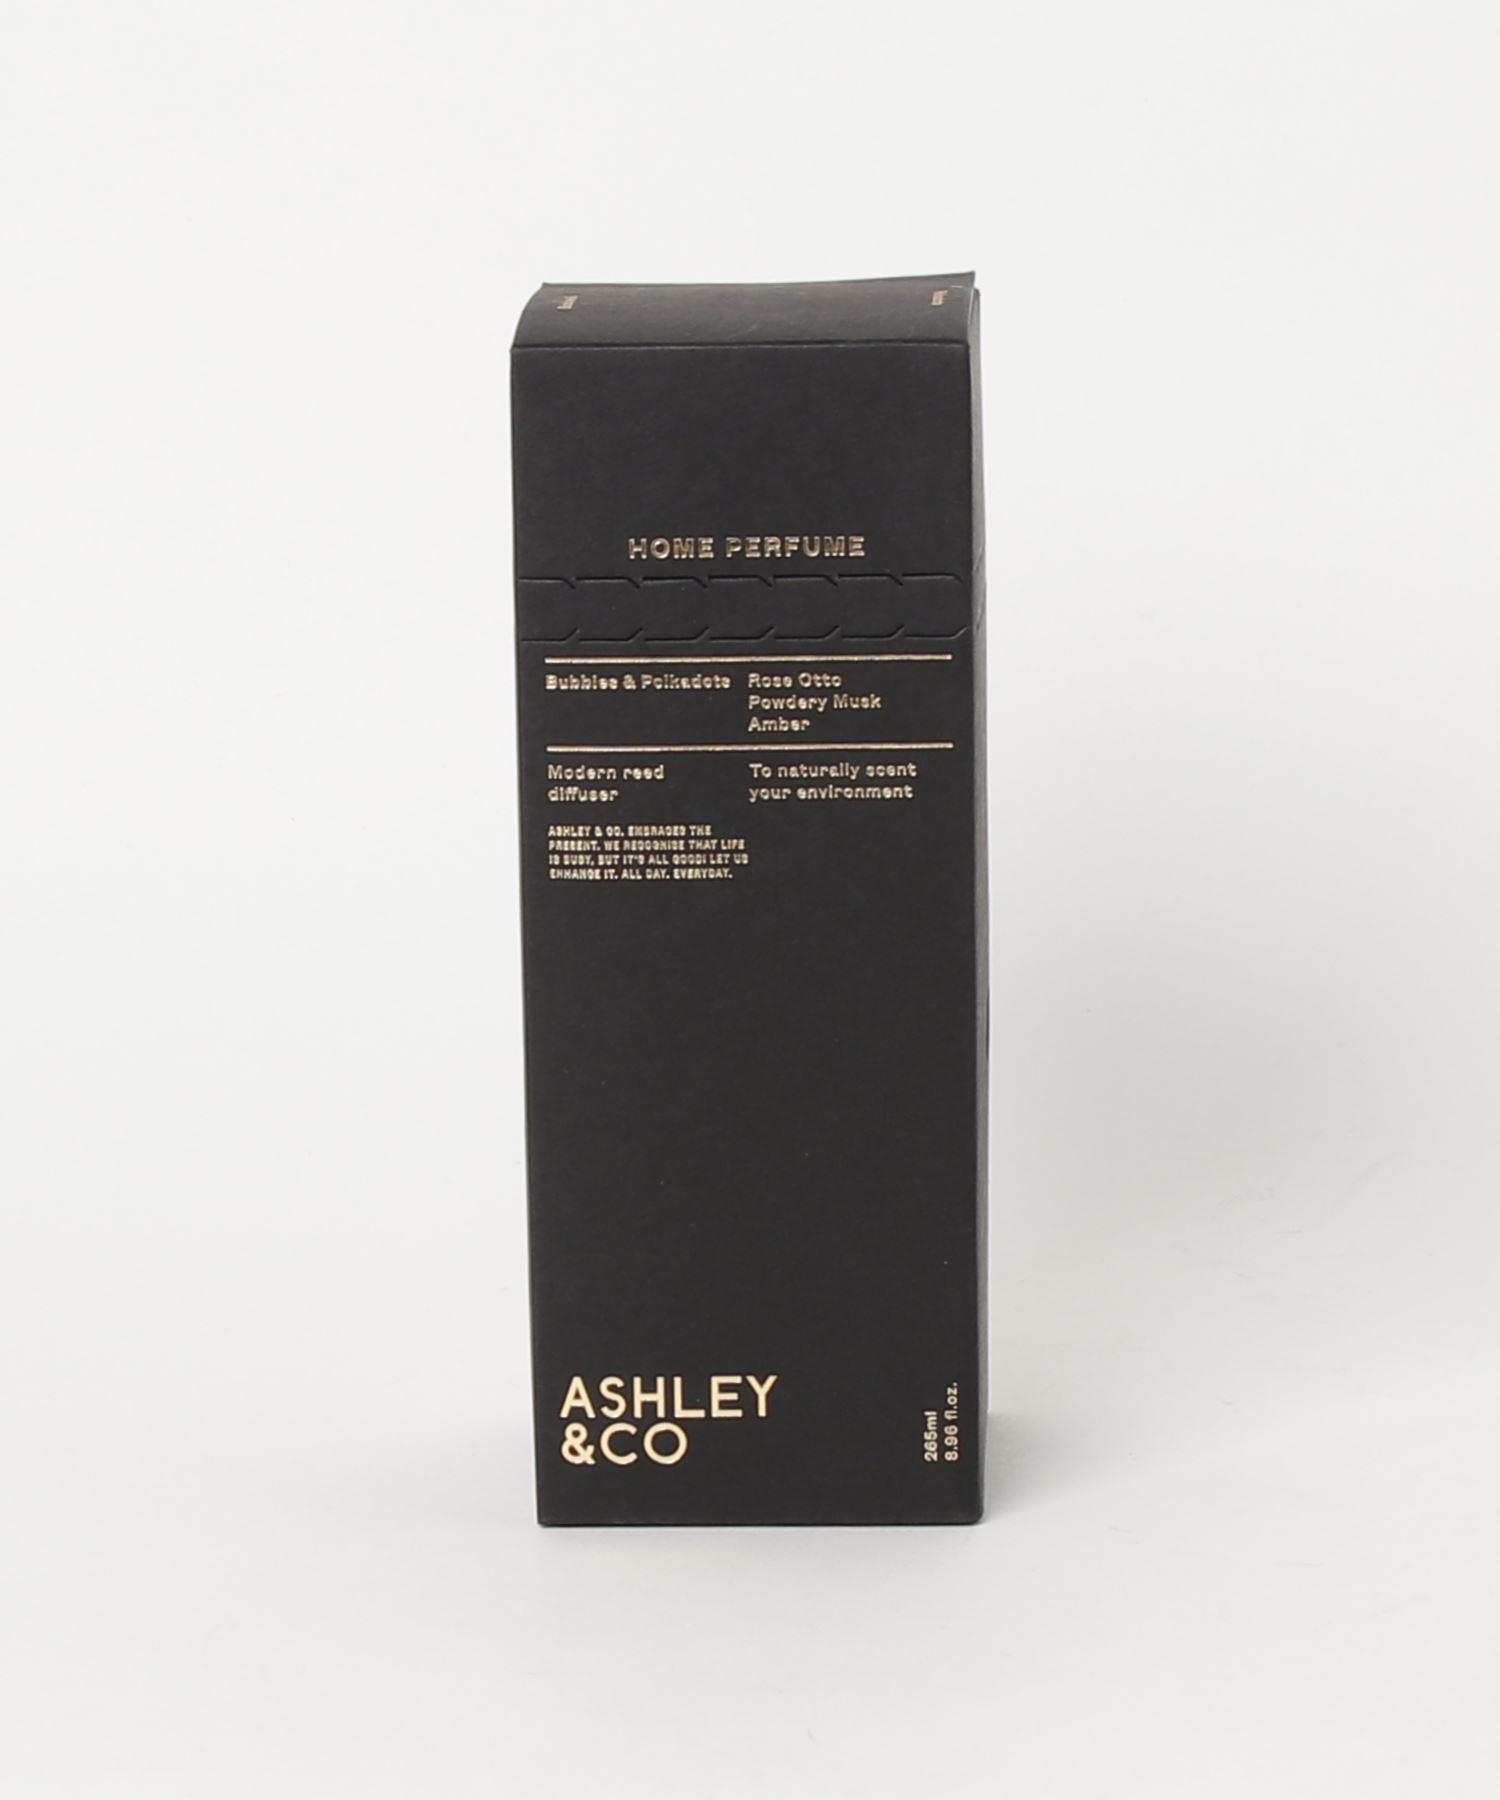 ASHLEY & CO ディフューザー Bubbles & Polkadots 265ml